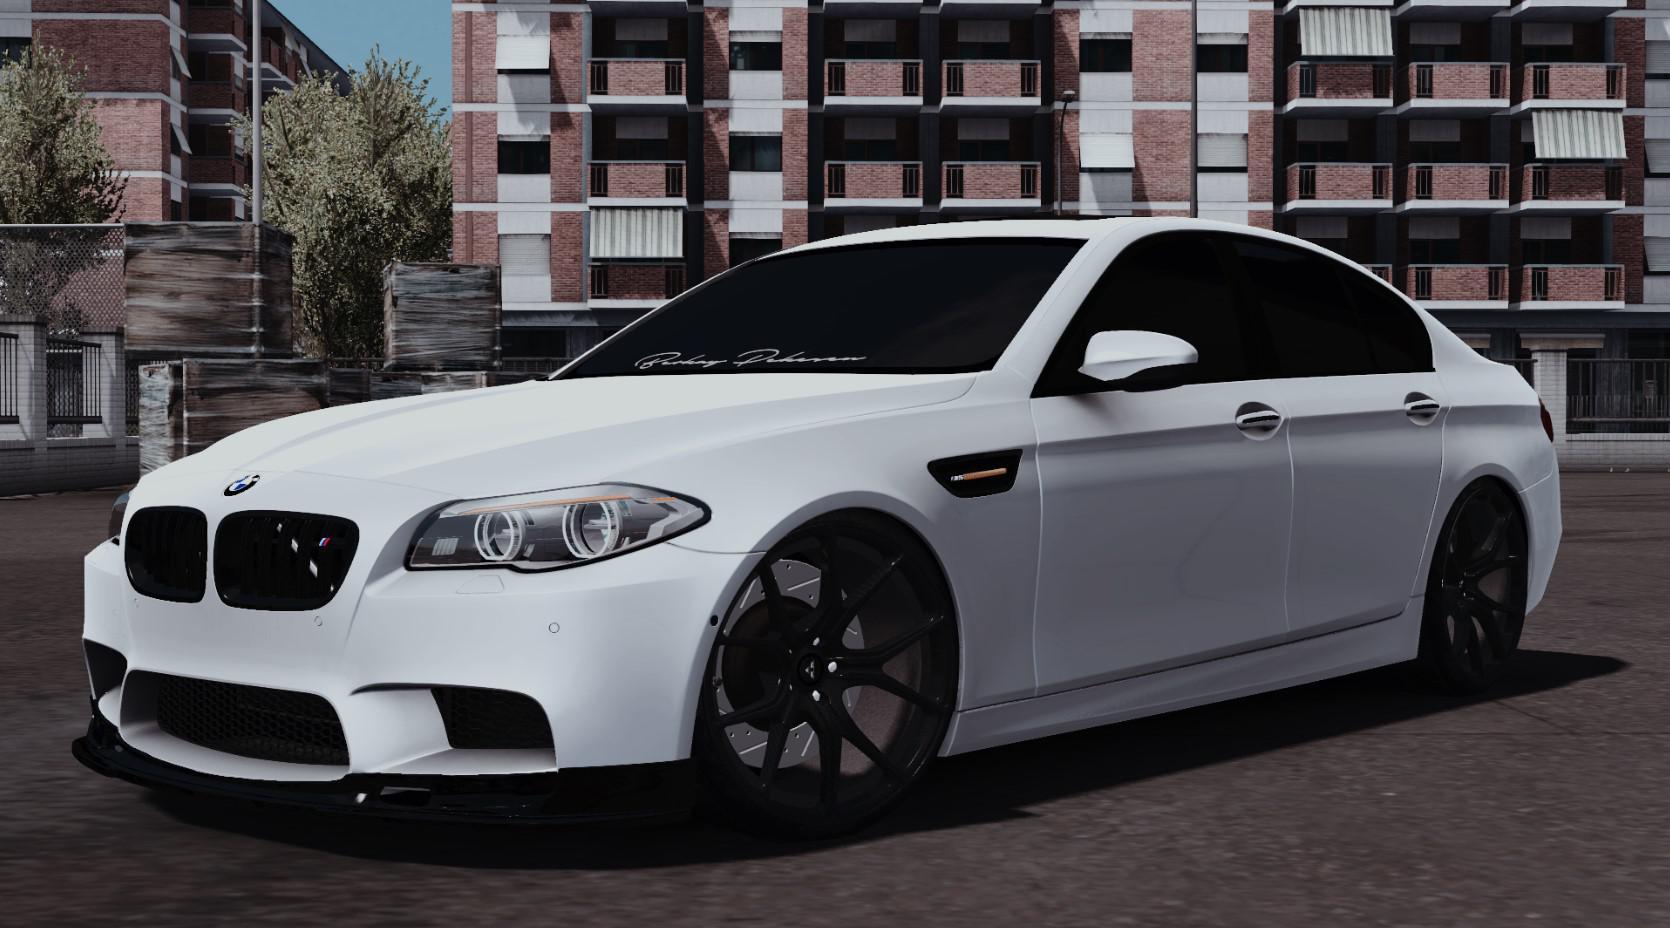 ETS2 - BMW M5 F10 Car Mod V2.0 (1.36.x)